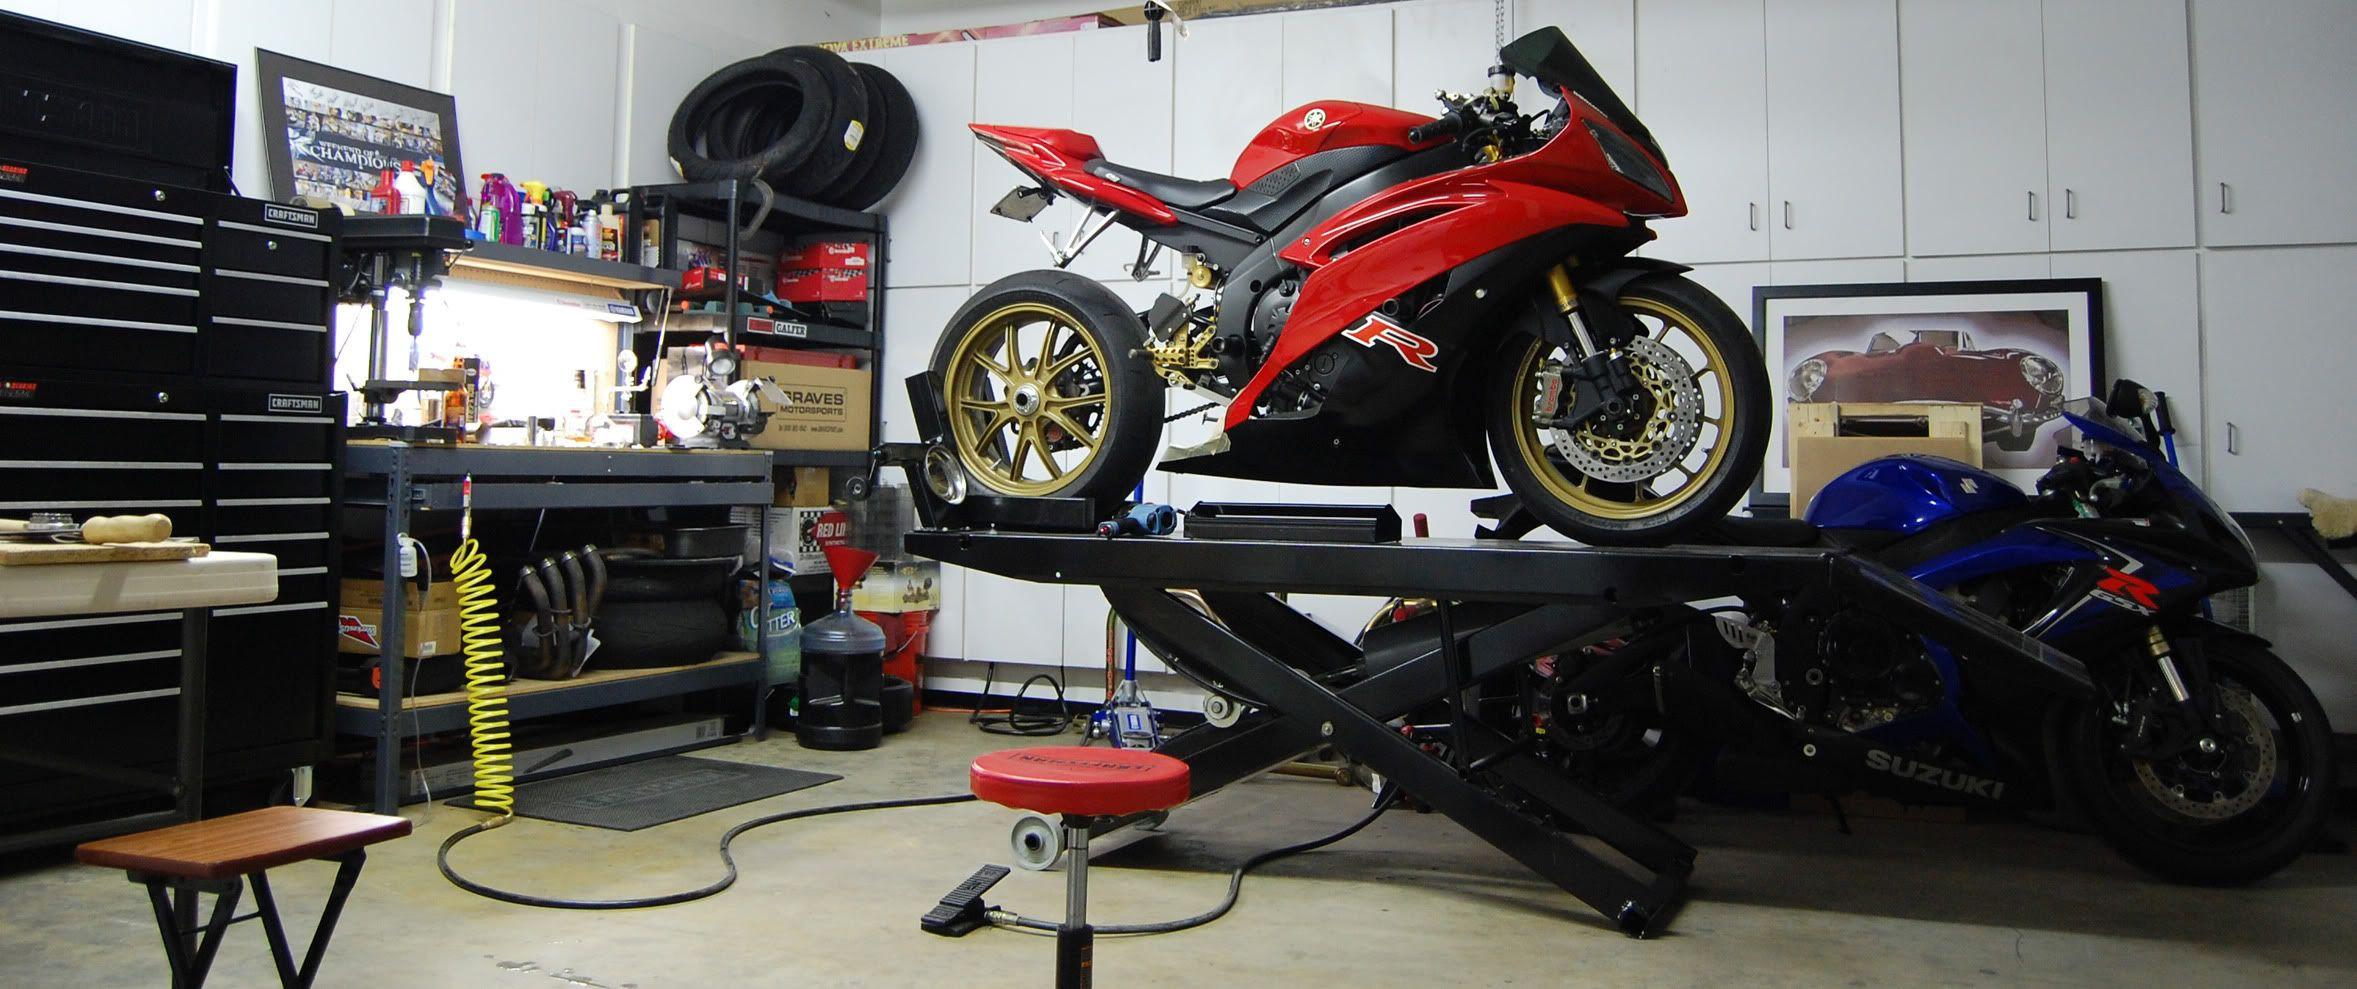 Motorcycle dream garage pesquisa google bike shop for Garage custom moto